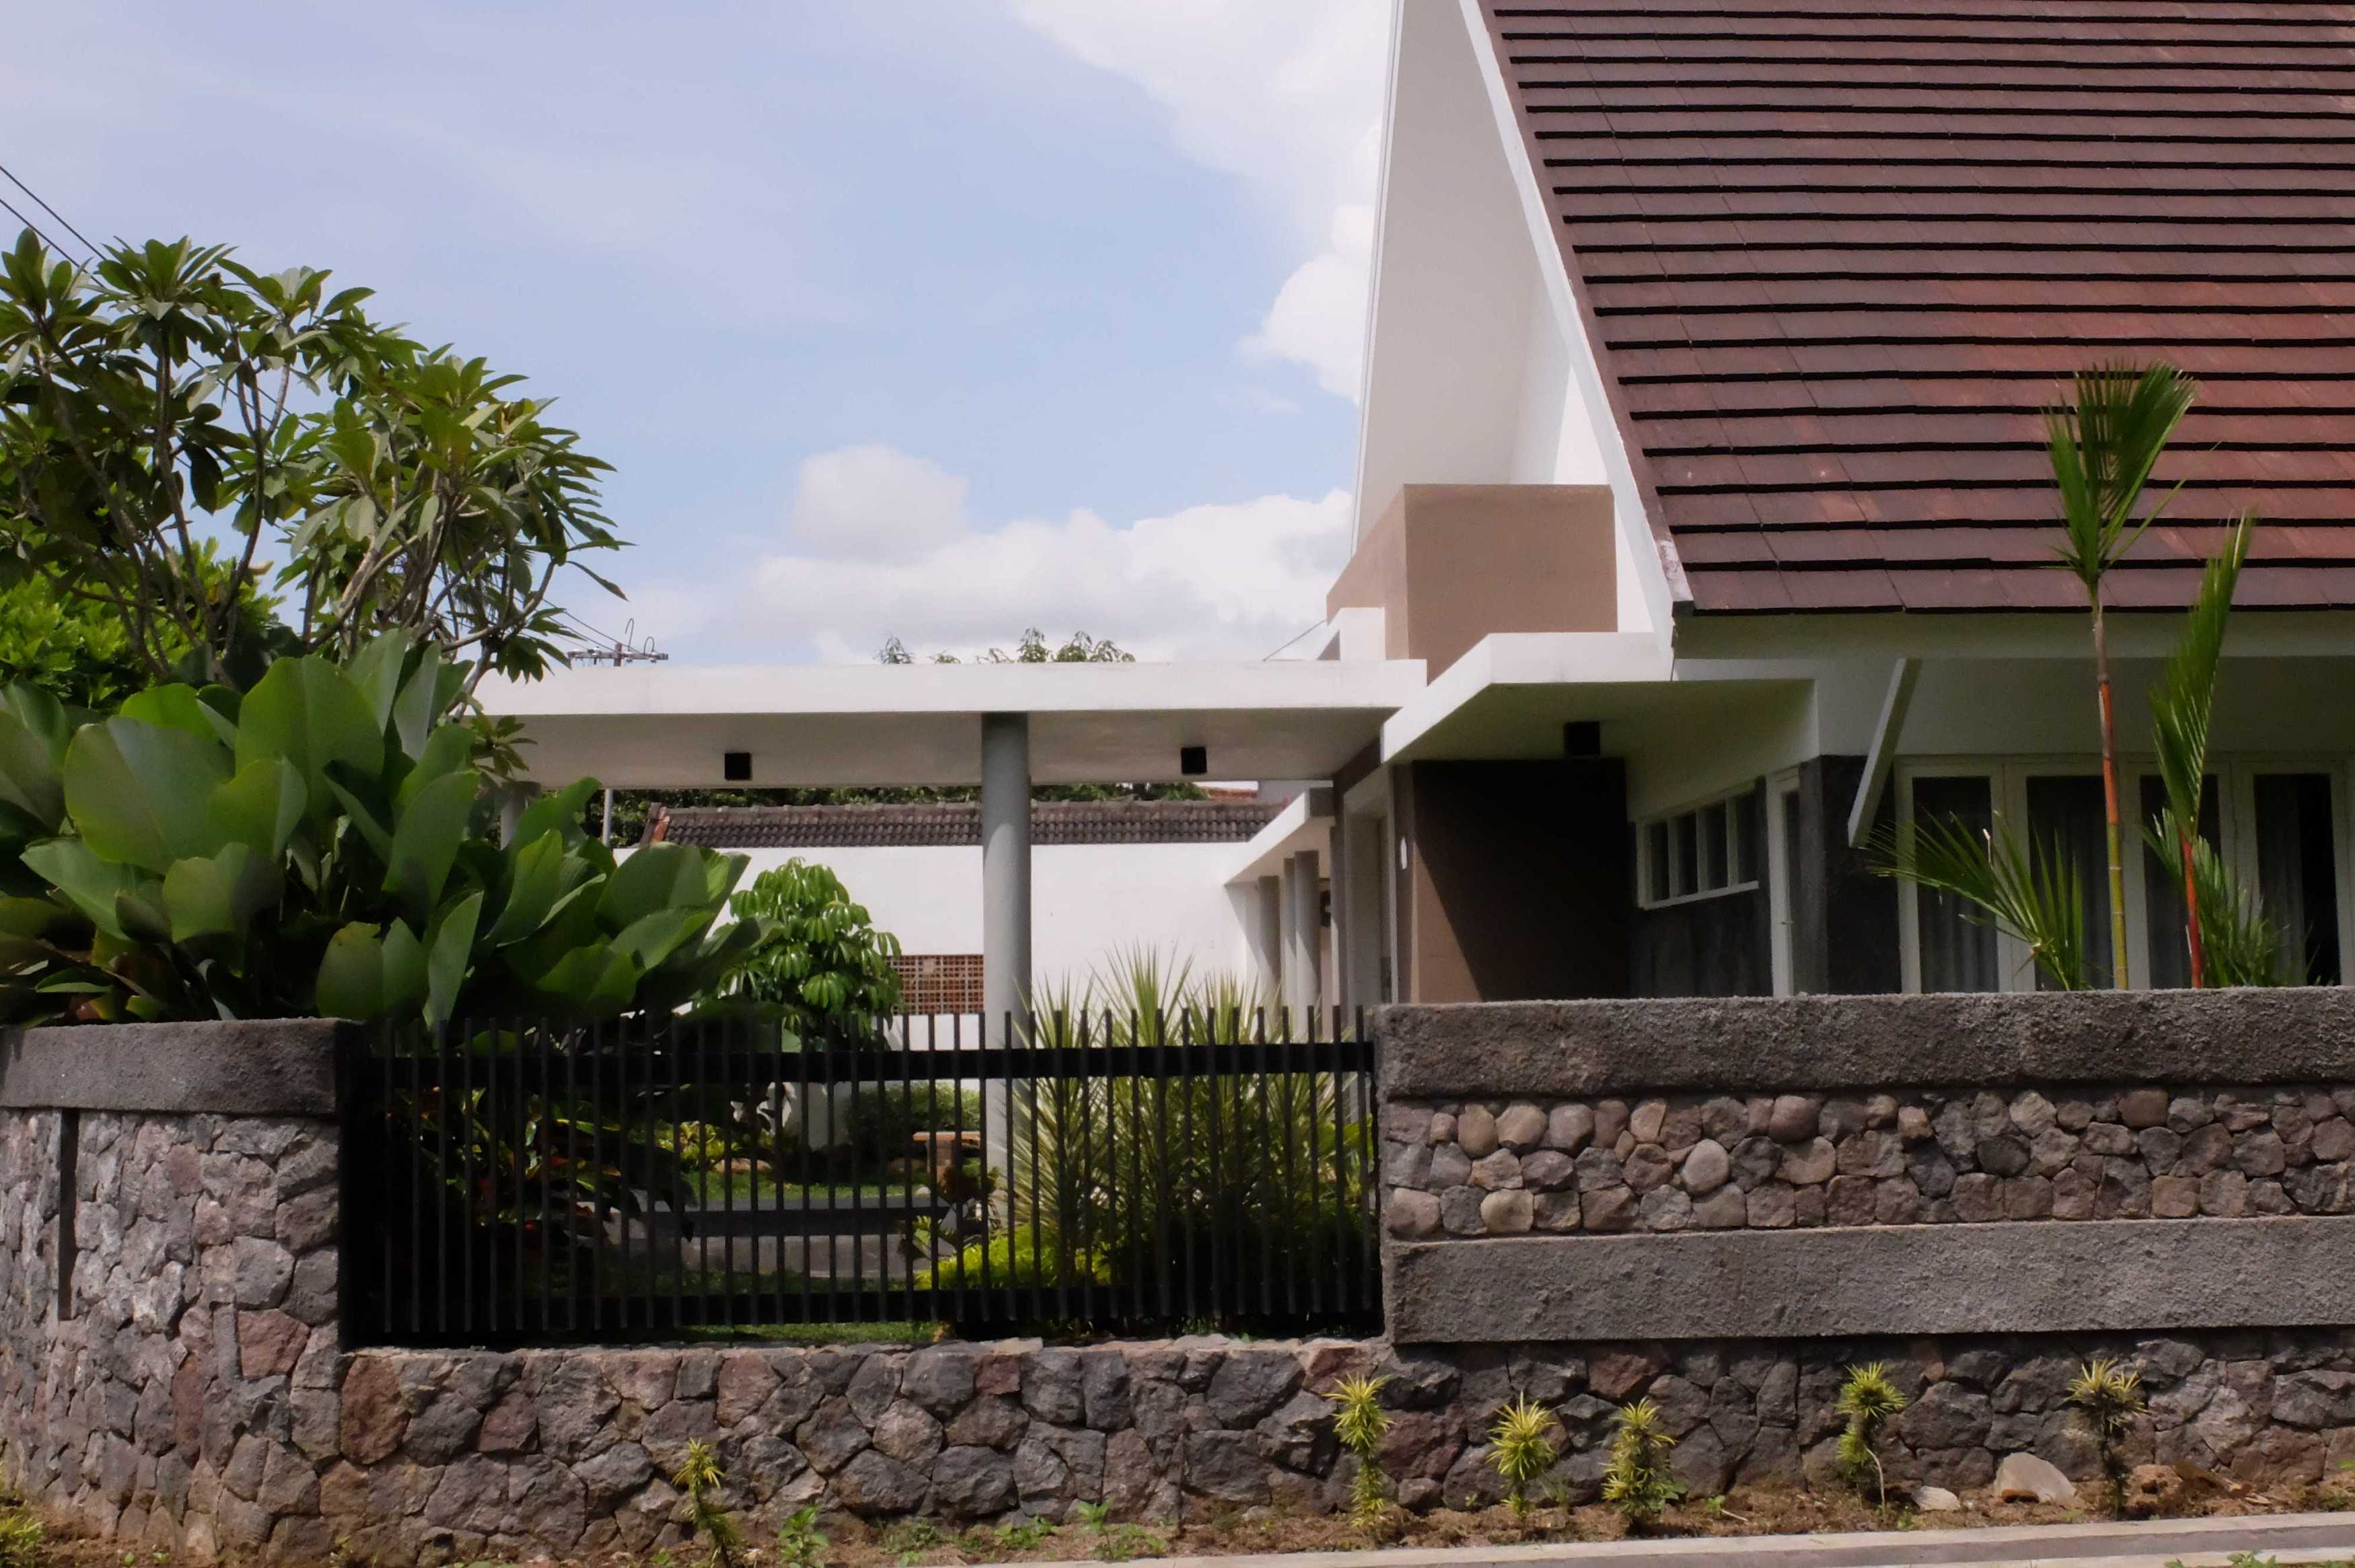 Duatitik Architecture Rumah Kesemek Malang, Jawa Timur Malang, Jawa Timur 2015-01-22-22   29984